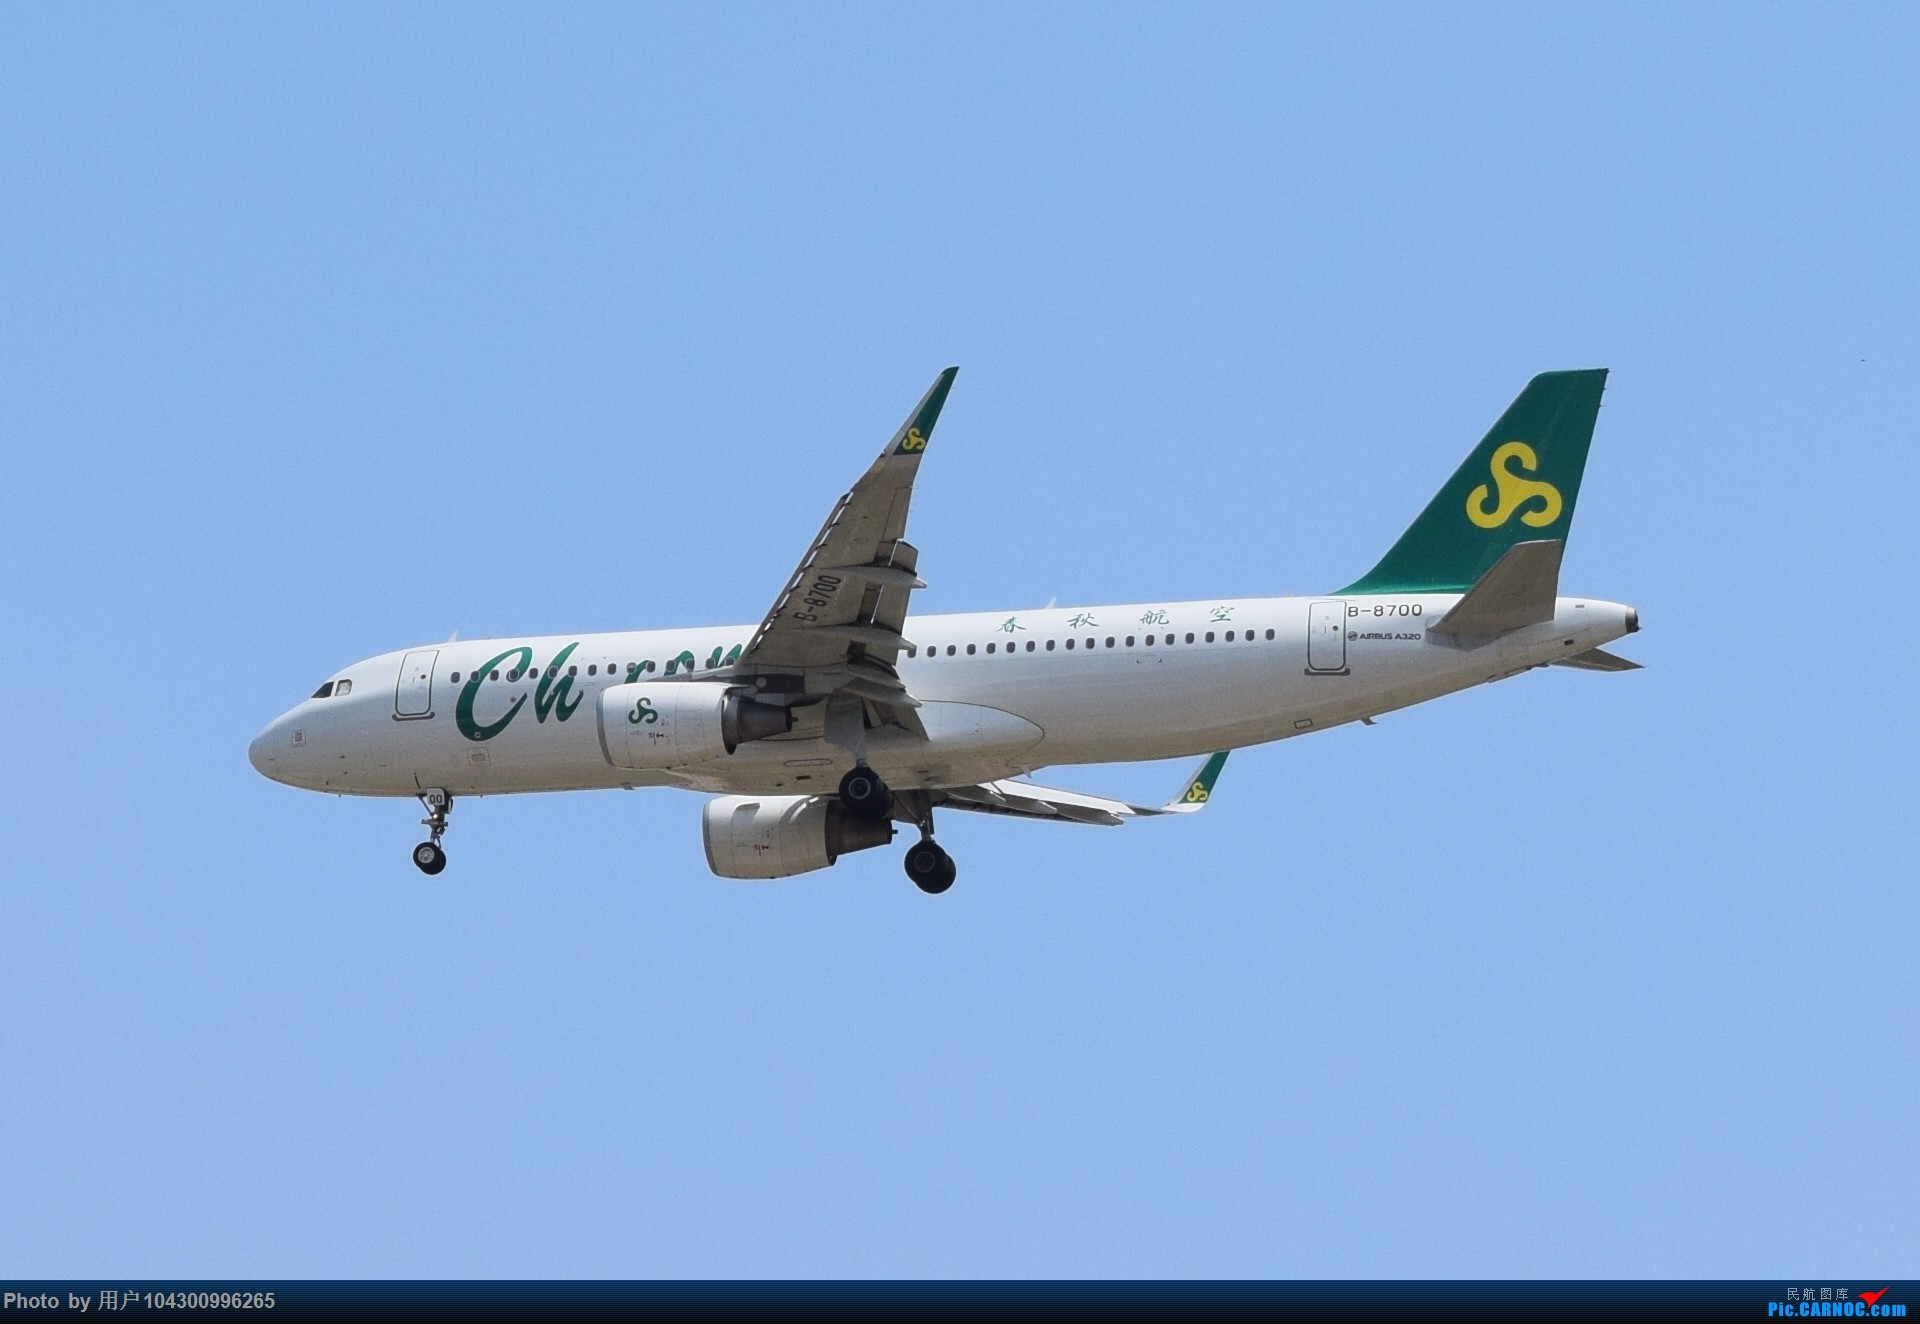 Re:[原创]贵阳龙洞堡杂图一览 AIRBUS A320-200 B-8700 中国贵阳龙洞堡国际机场